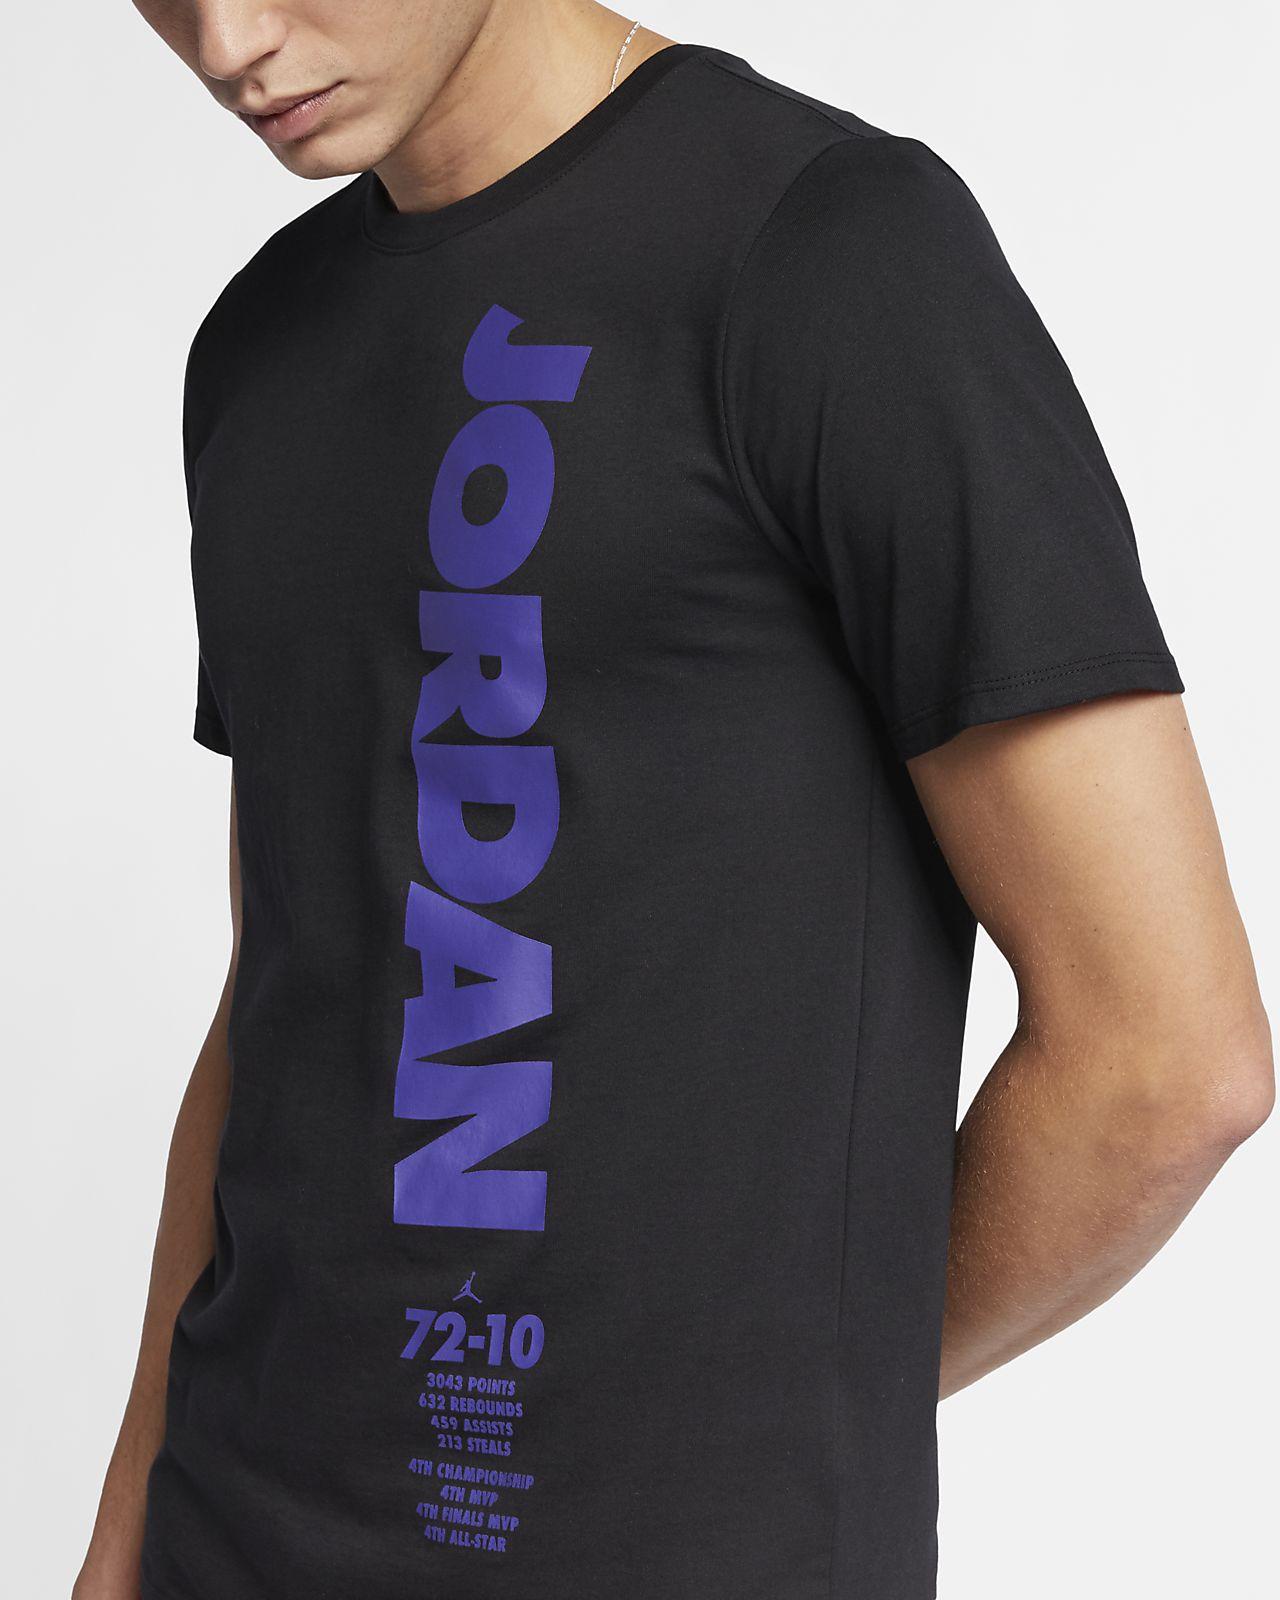 d93368c5bc94 Ανδρικό T-Shirt Jordan Sportswear Legacy AJ 11. Nike.com GR